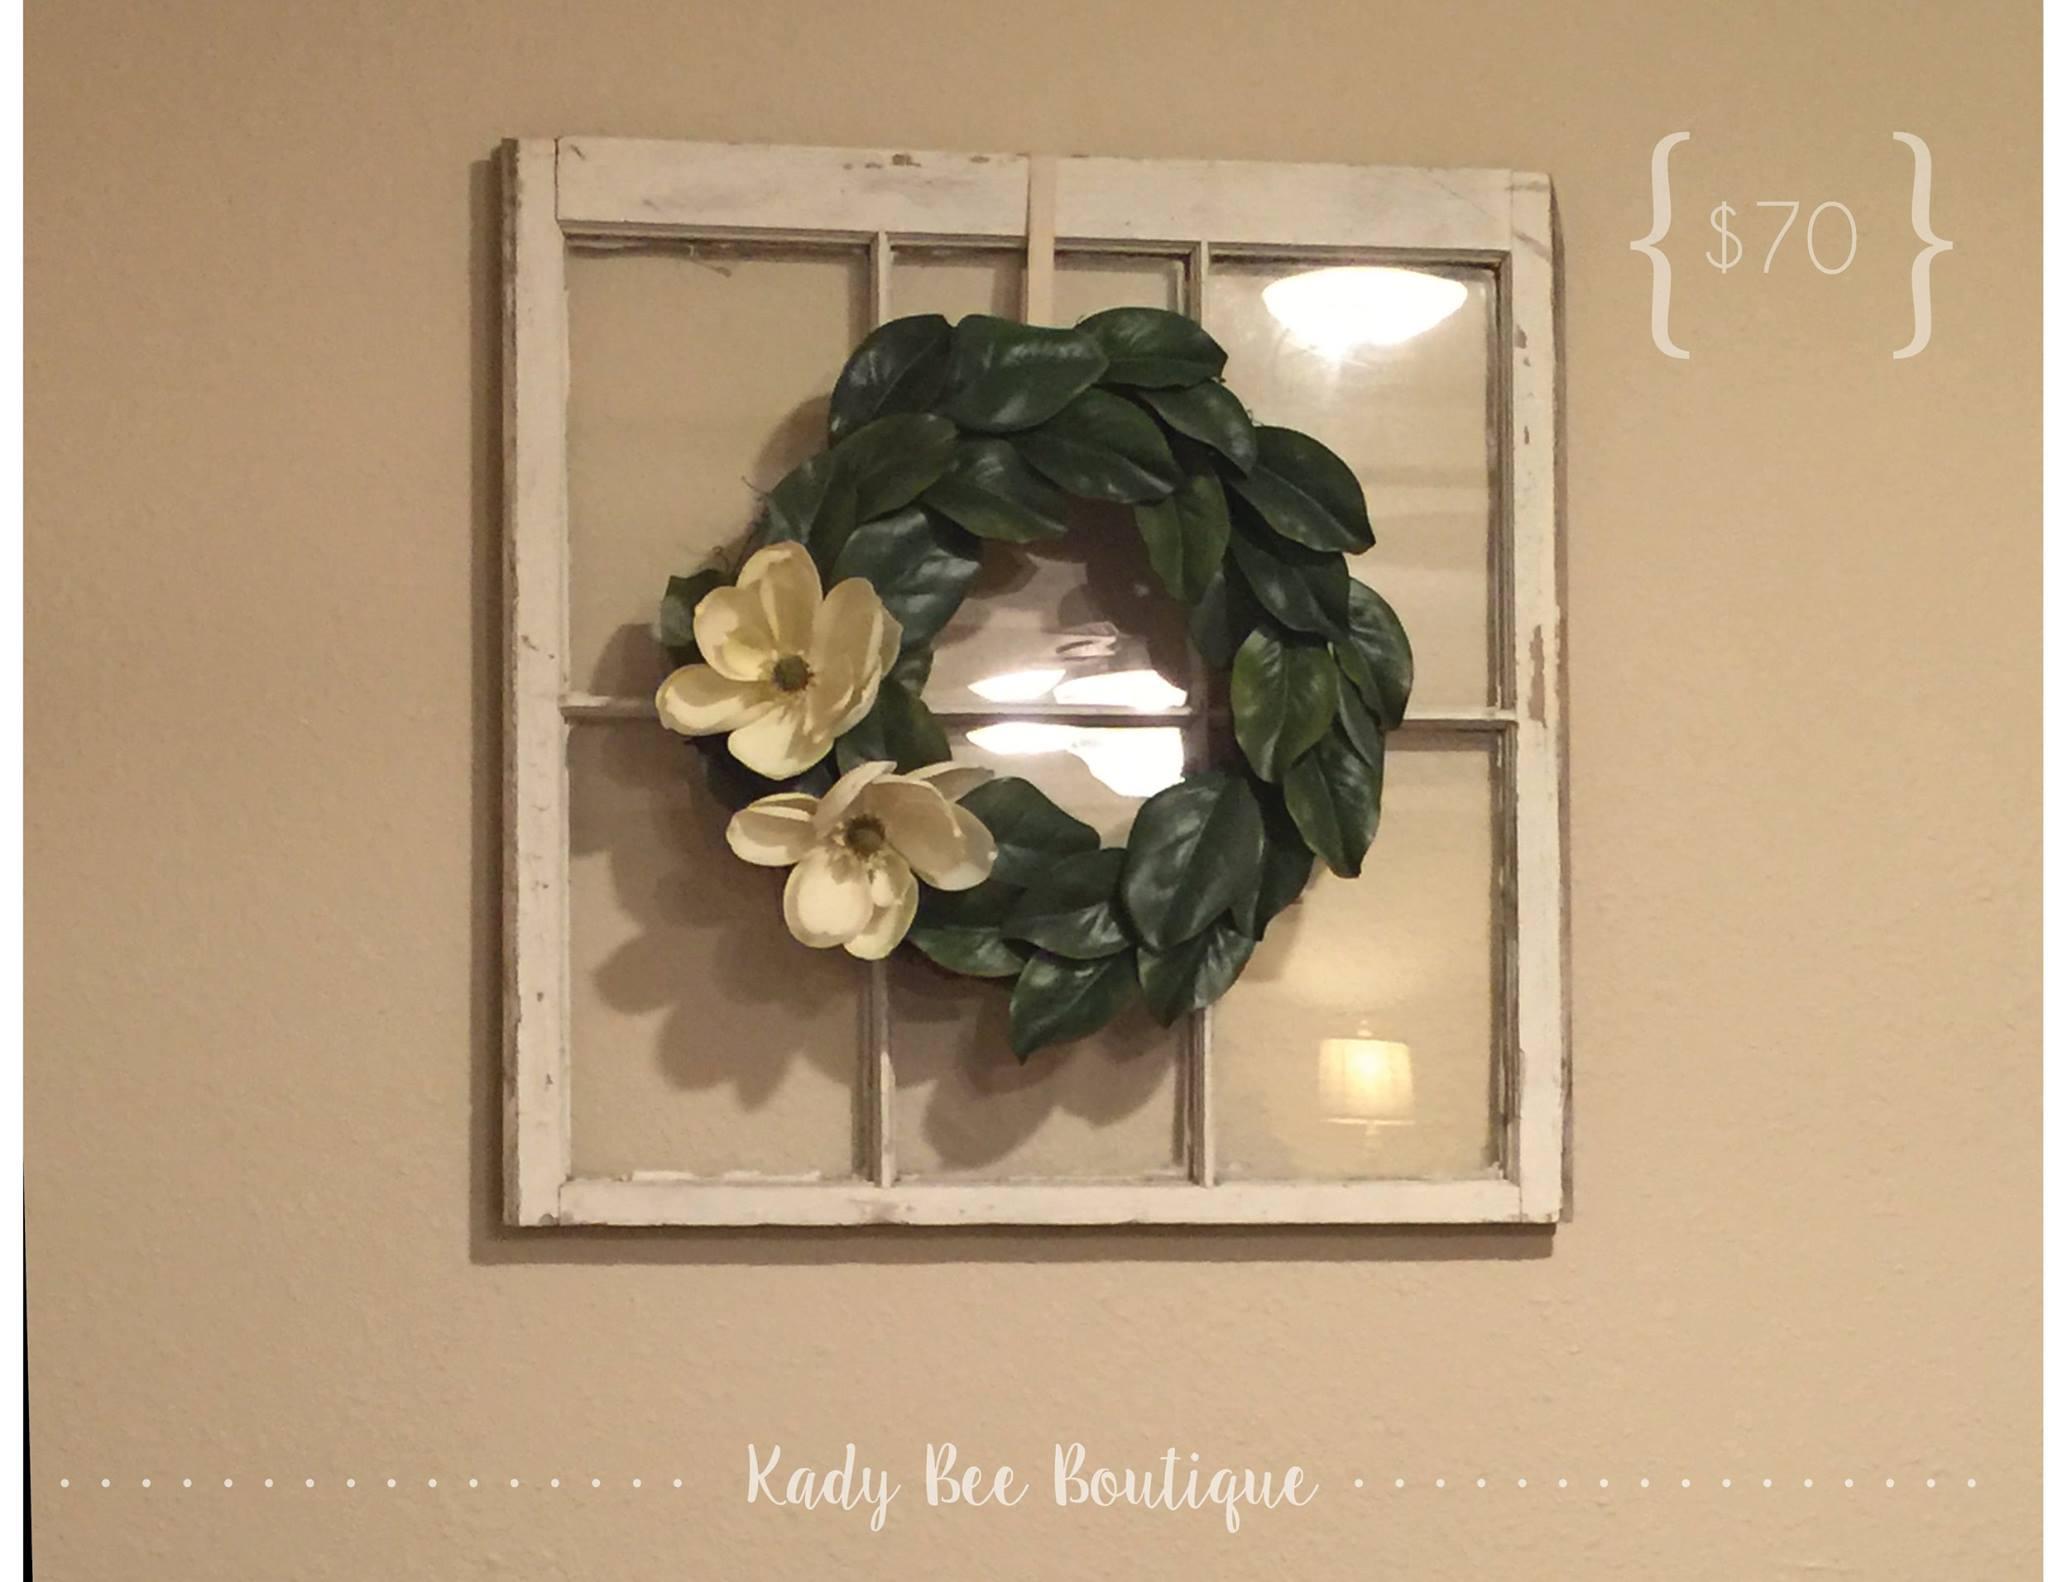 Kady Bee Boutique